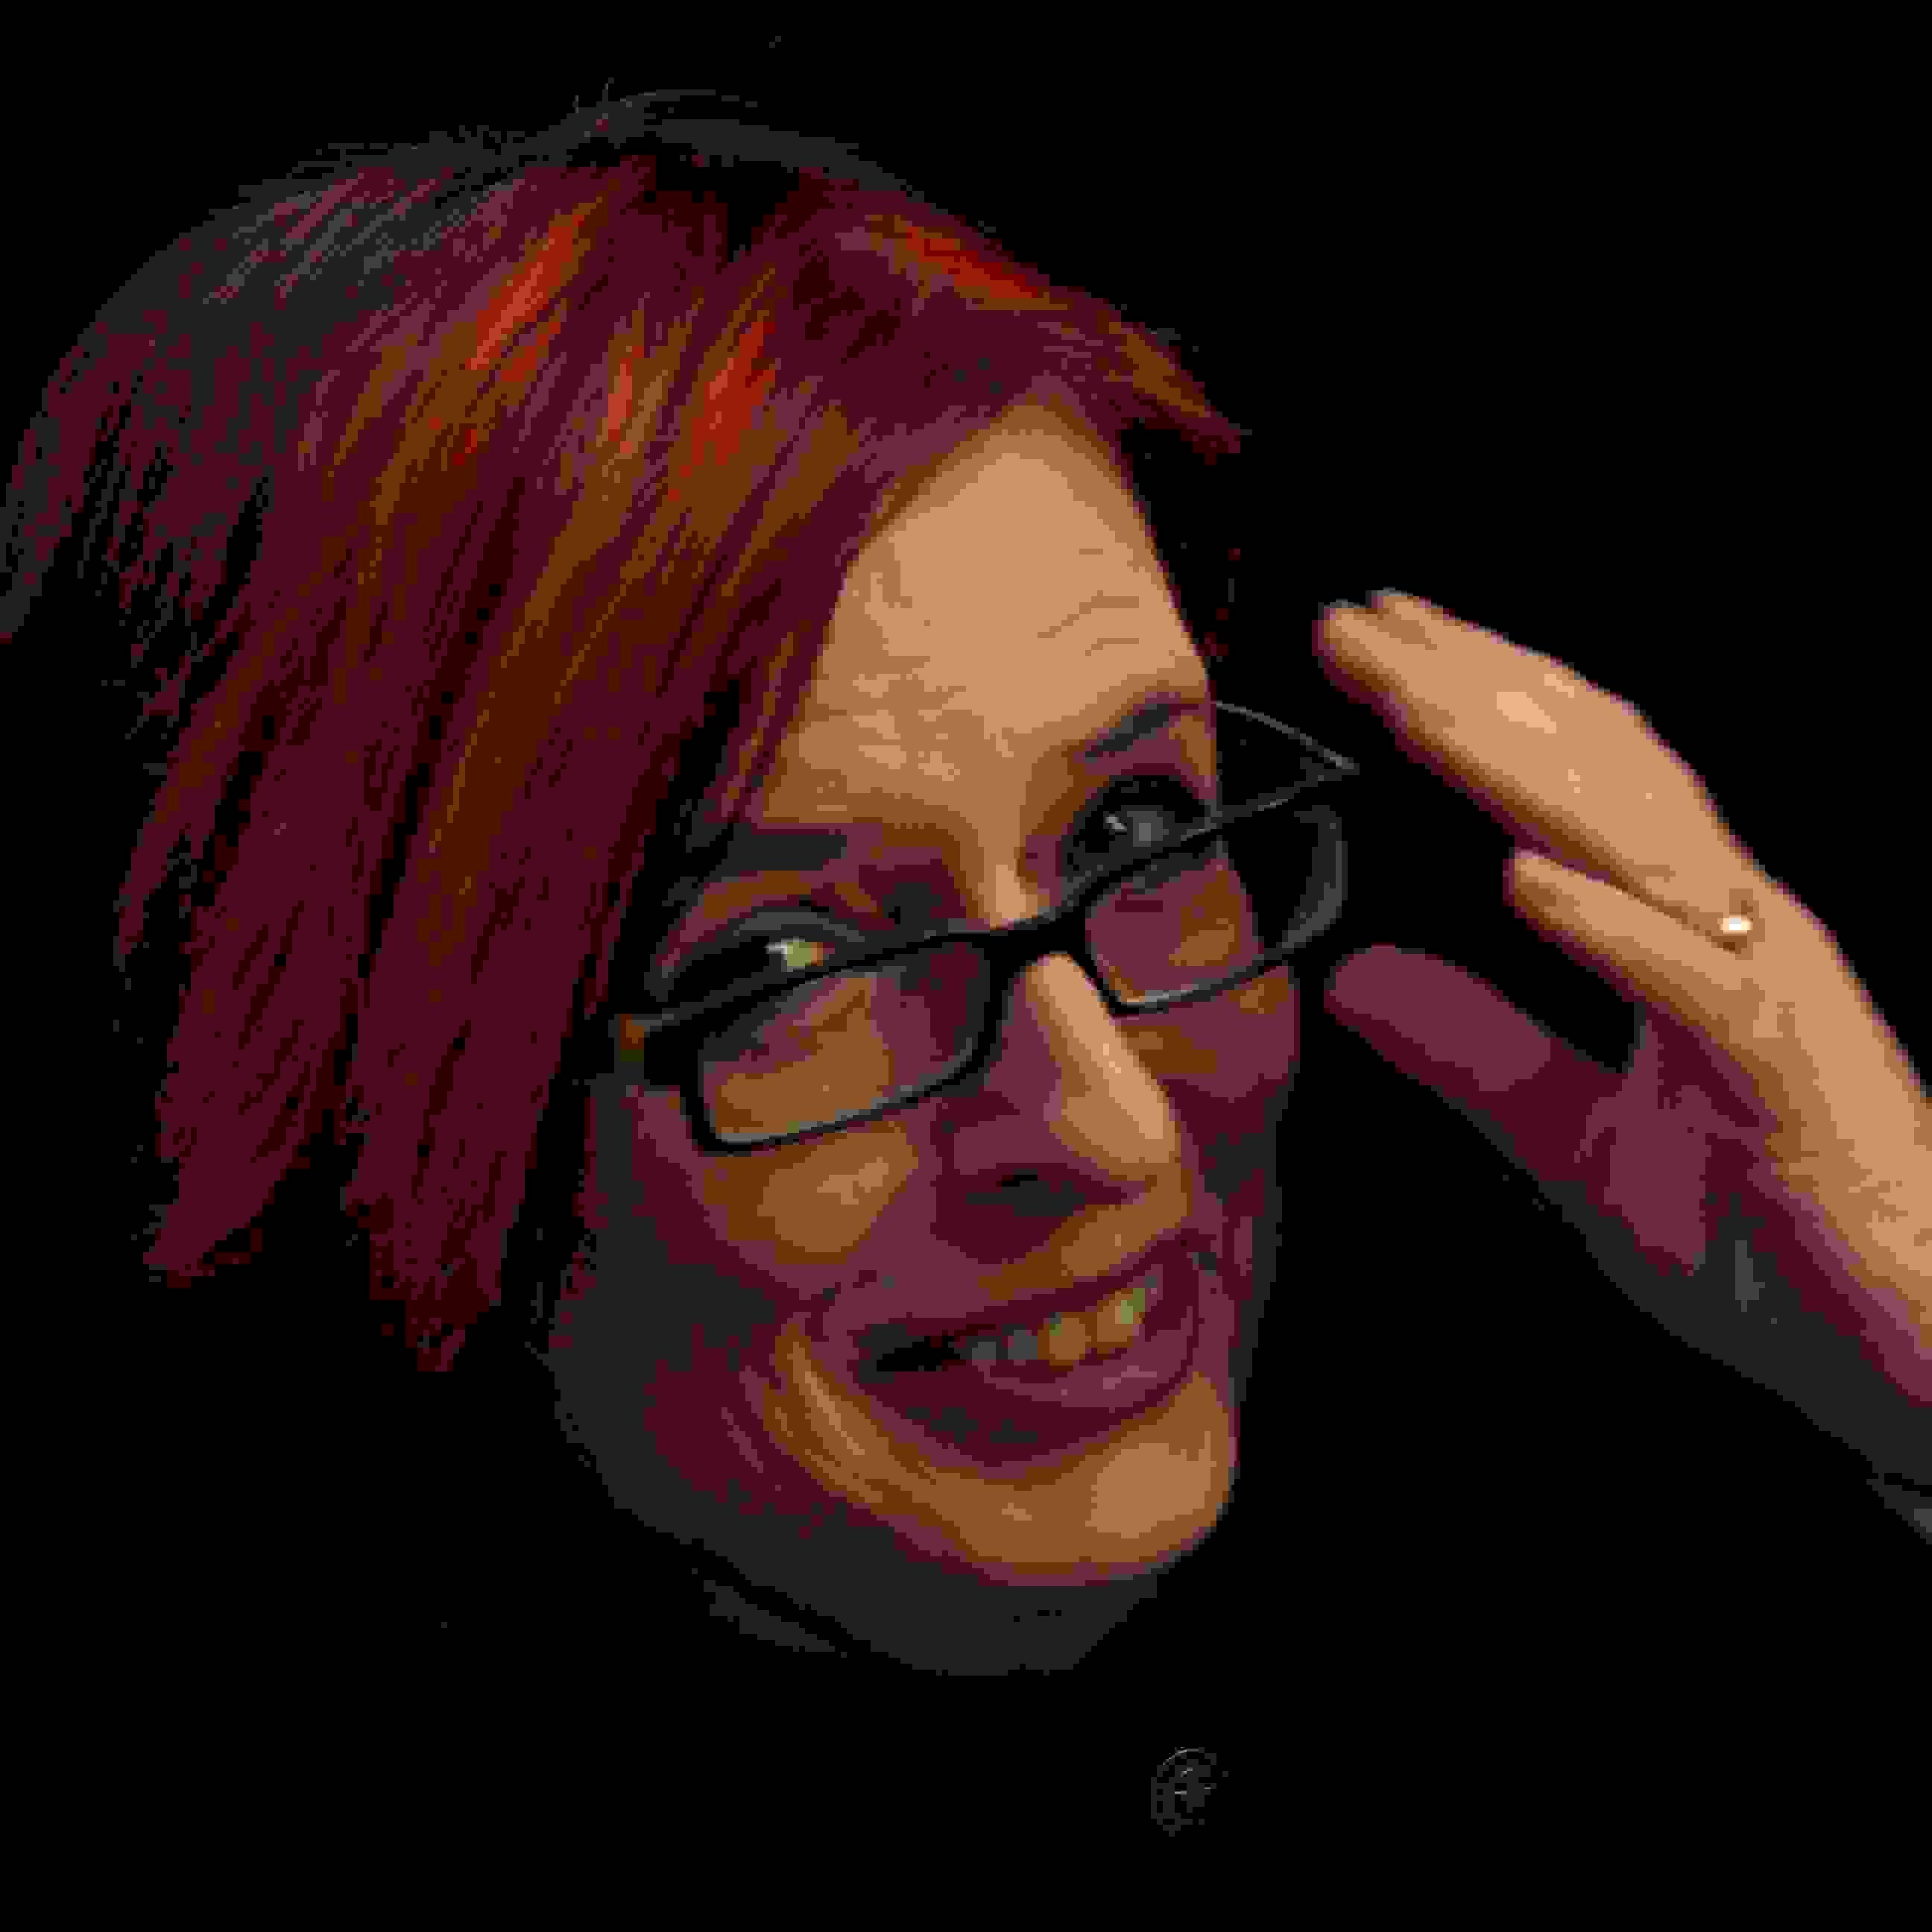 Alison Croggon: Building Worlds: How to Make Fantasy Real